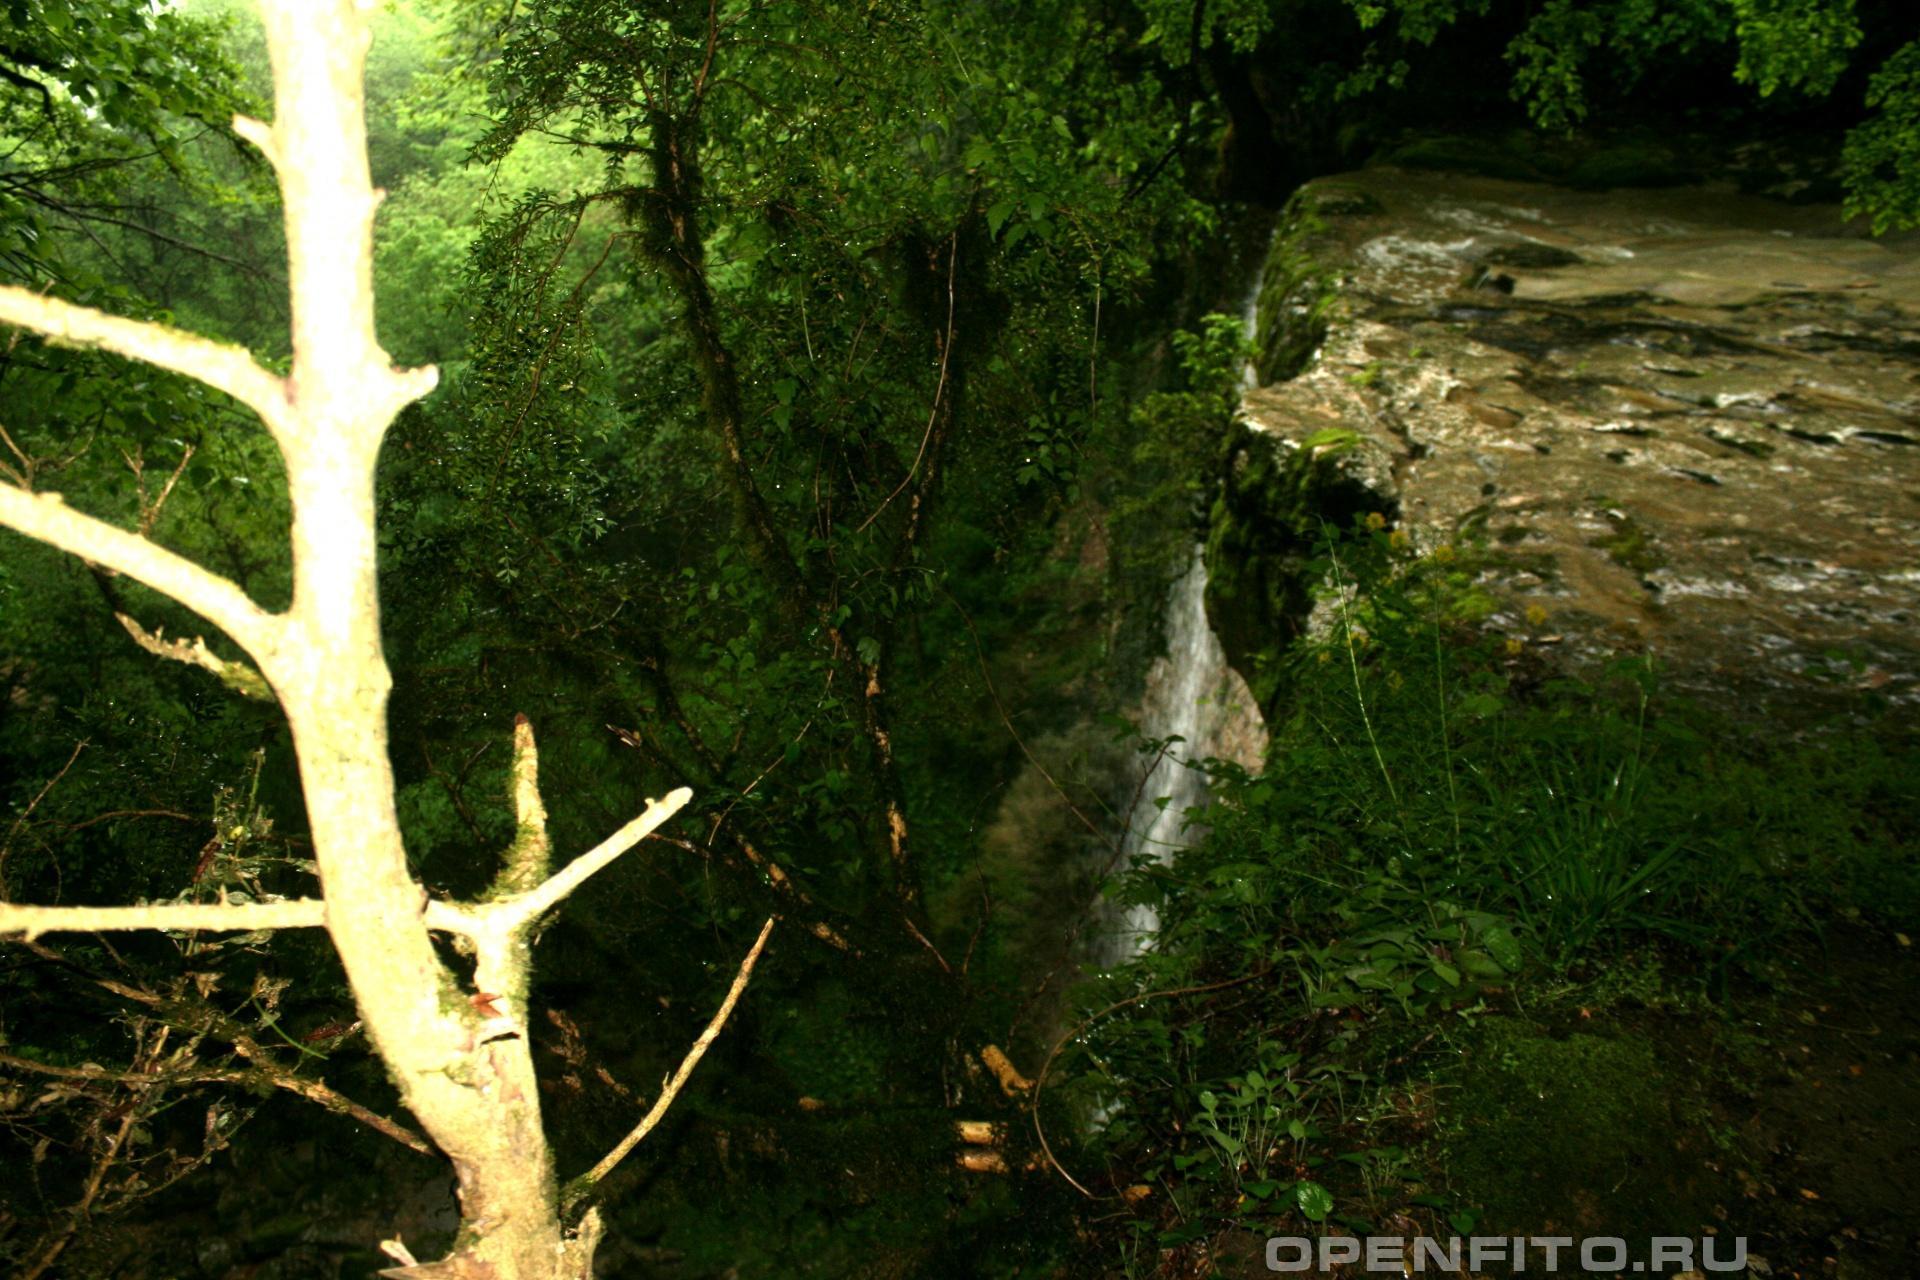 Шакуранский водопад вид сверху, Абхазия, сухумский район